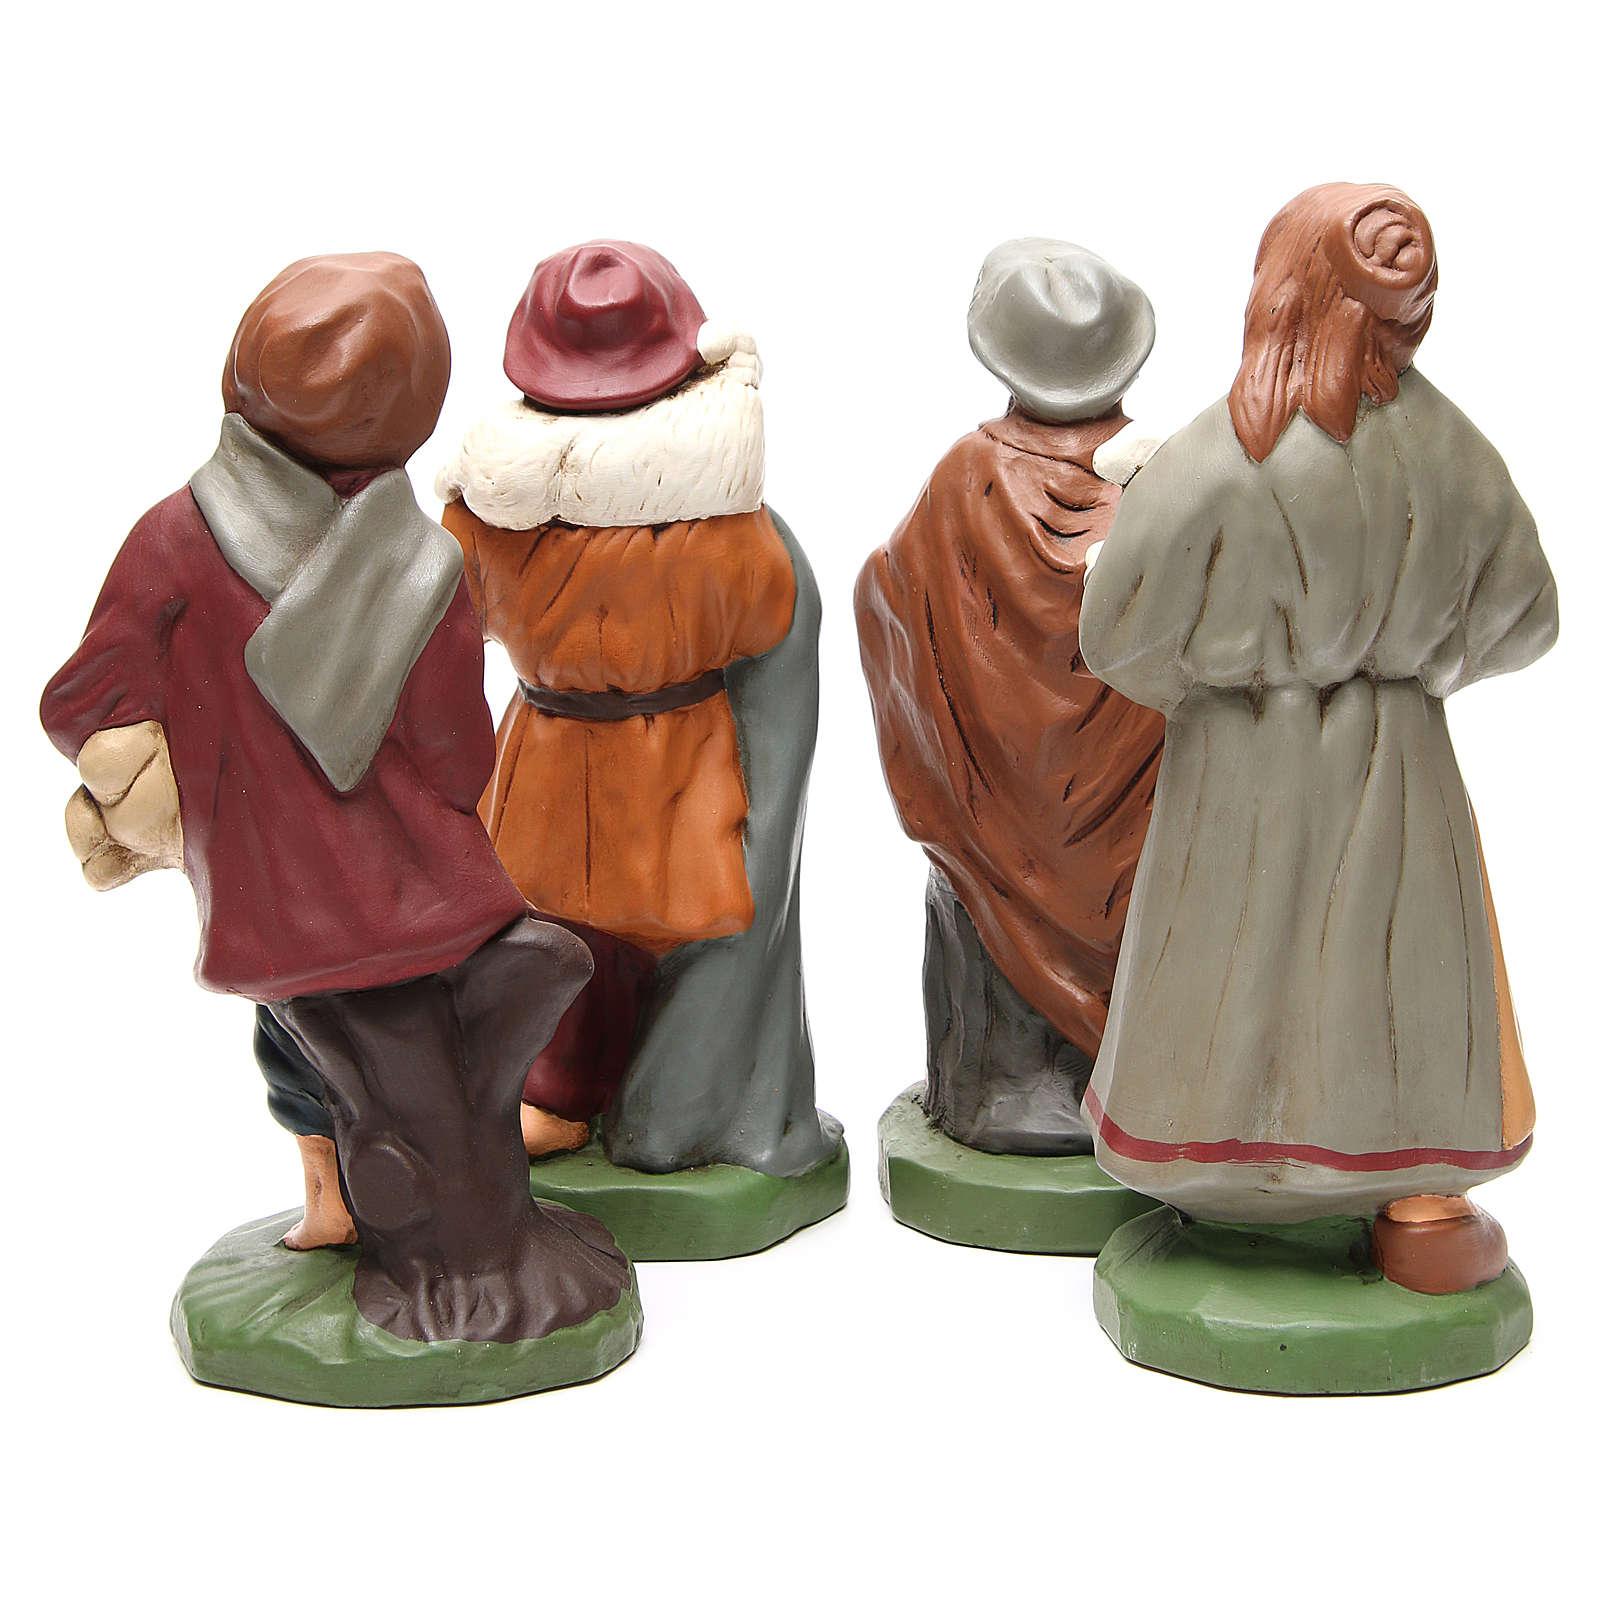 Pastores terracota pintada belén 30 cm, 4 figuras 4